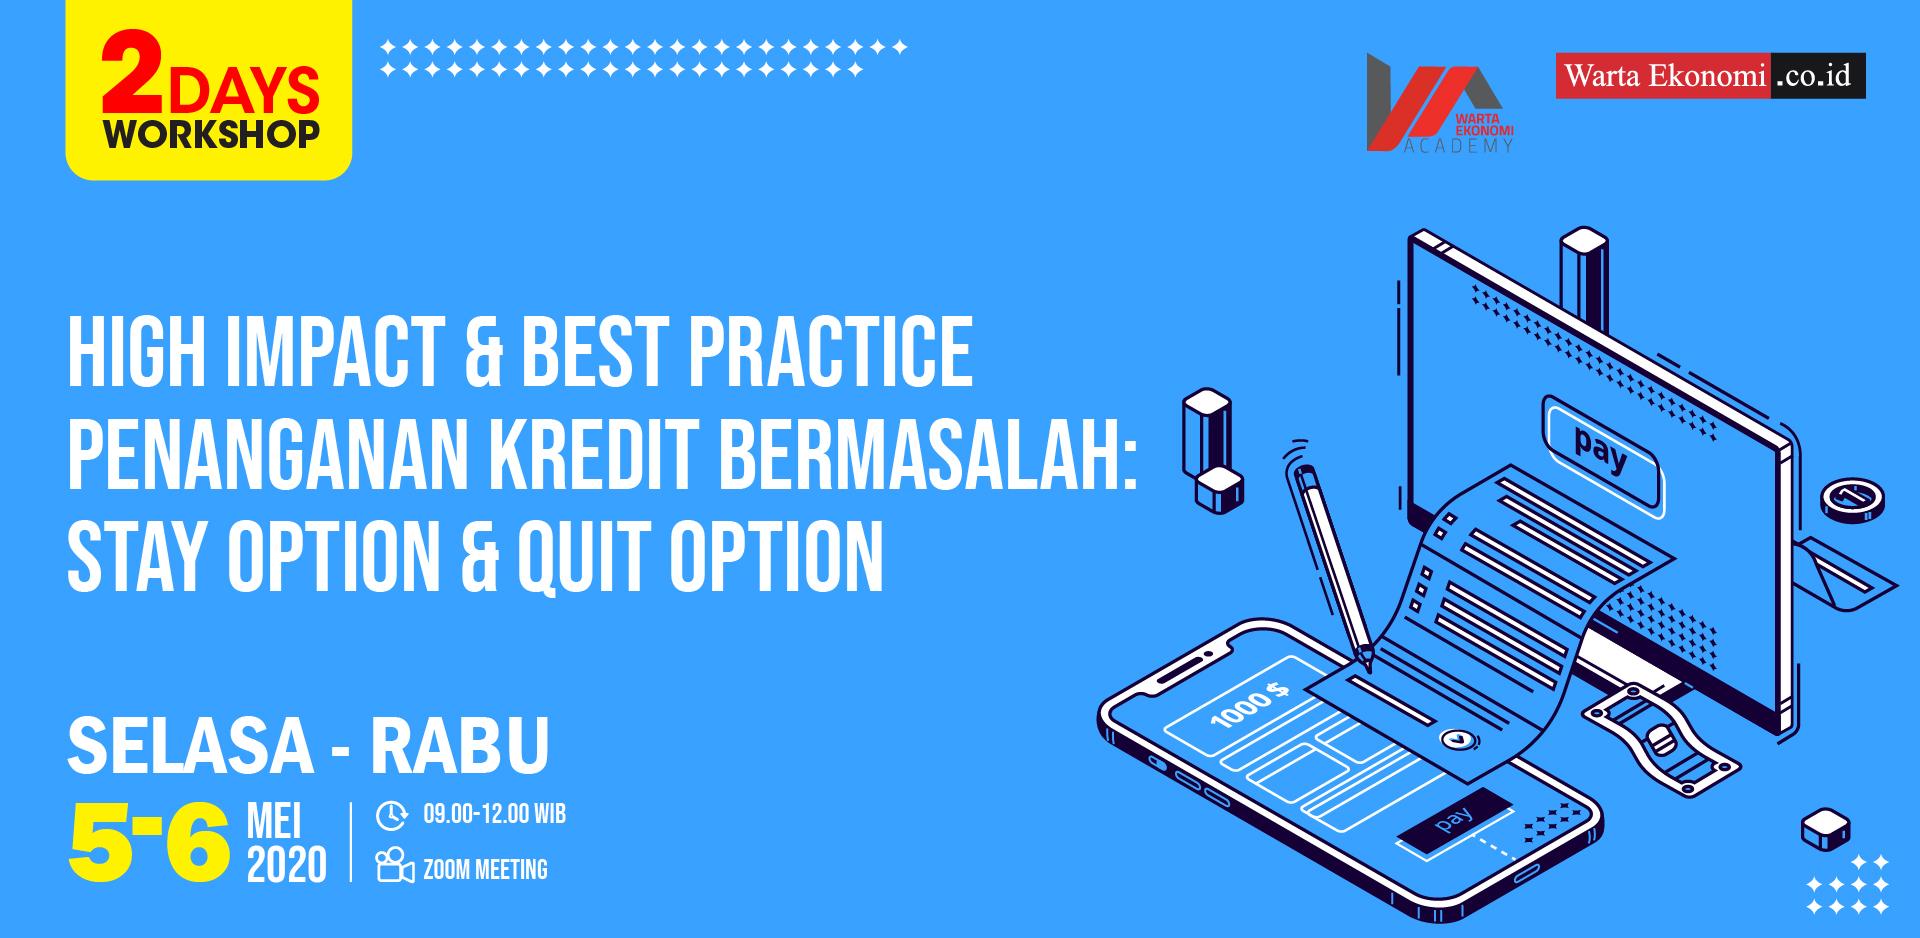 High Impact & Best Practice Penanganan Kredit Bermasalah: Stay Option & Quit Option